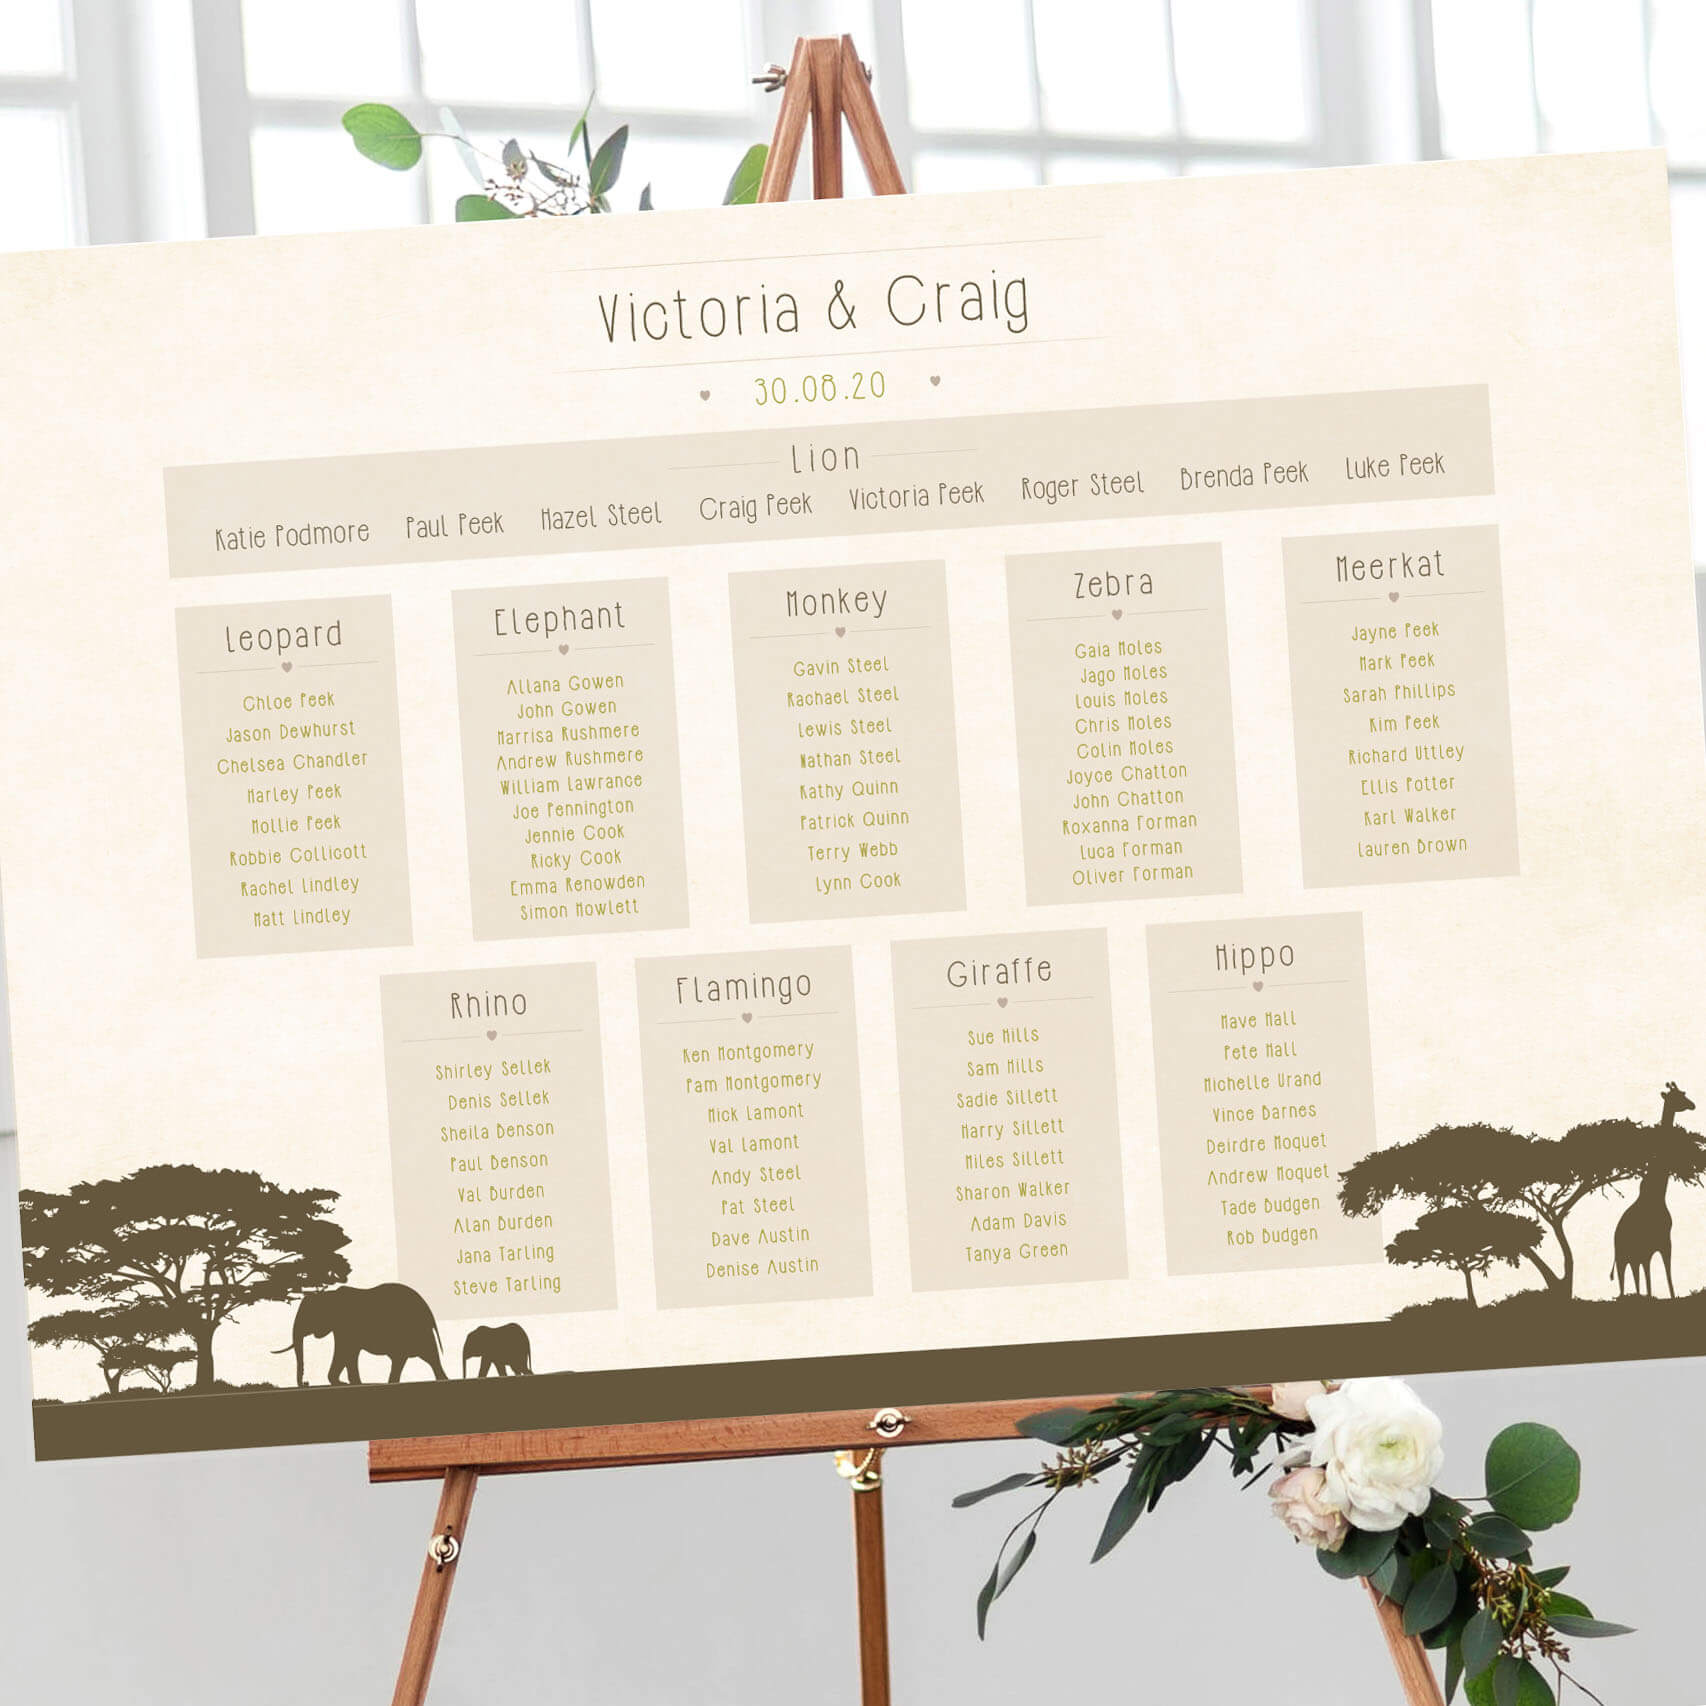 Safari Wedding Table Plan - Designed by Rodo Creative in Manchester